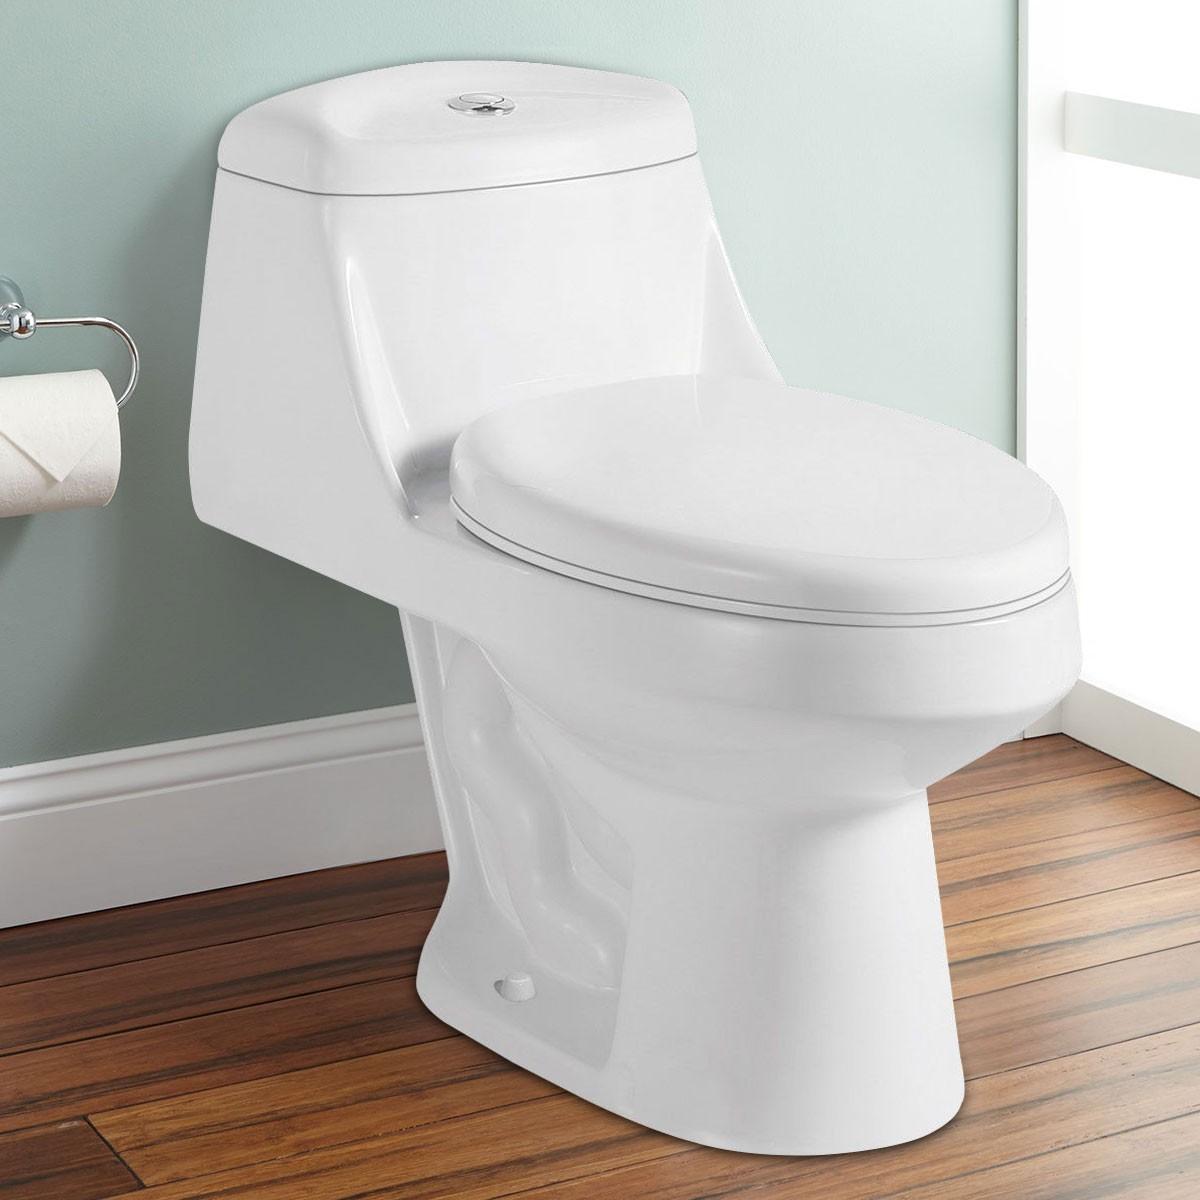 Dual Flush Siphonic One-piece Toilet (DK-ZBQ-12027) | Decoraport USA